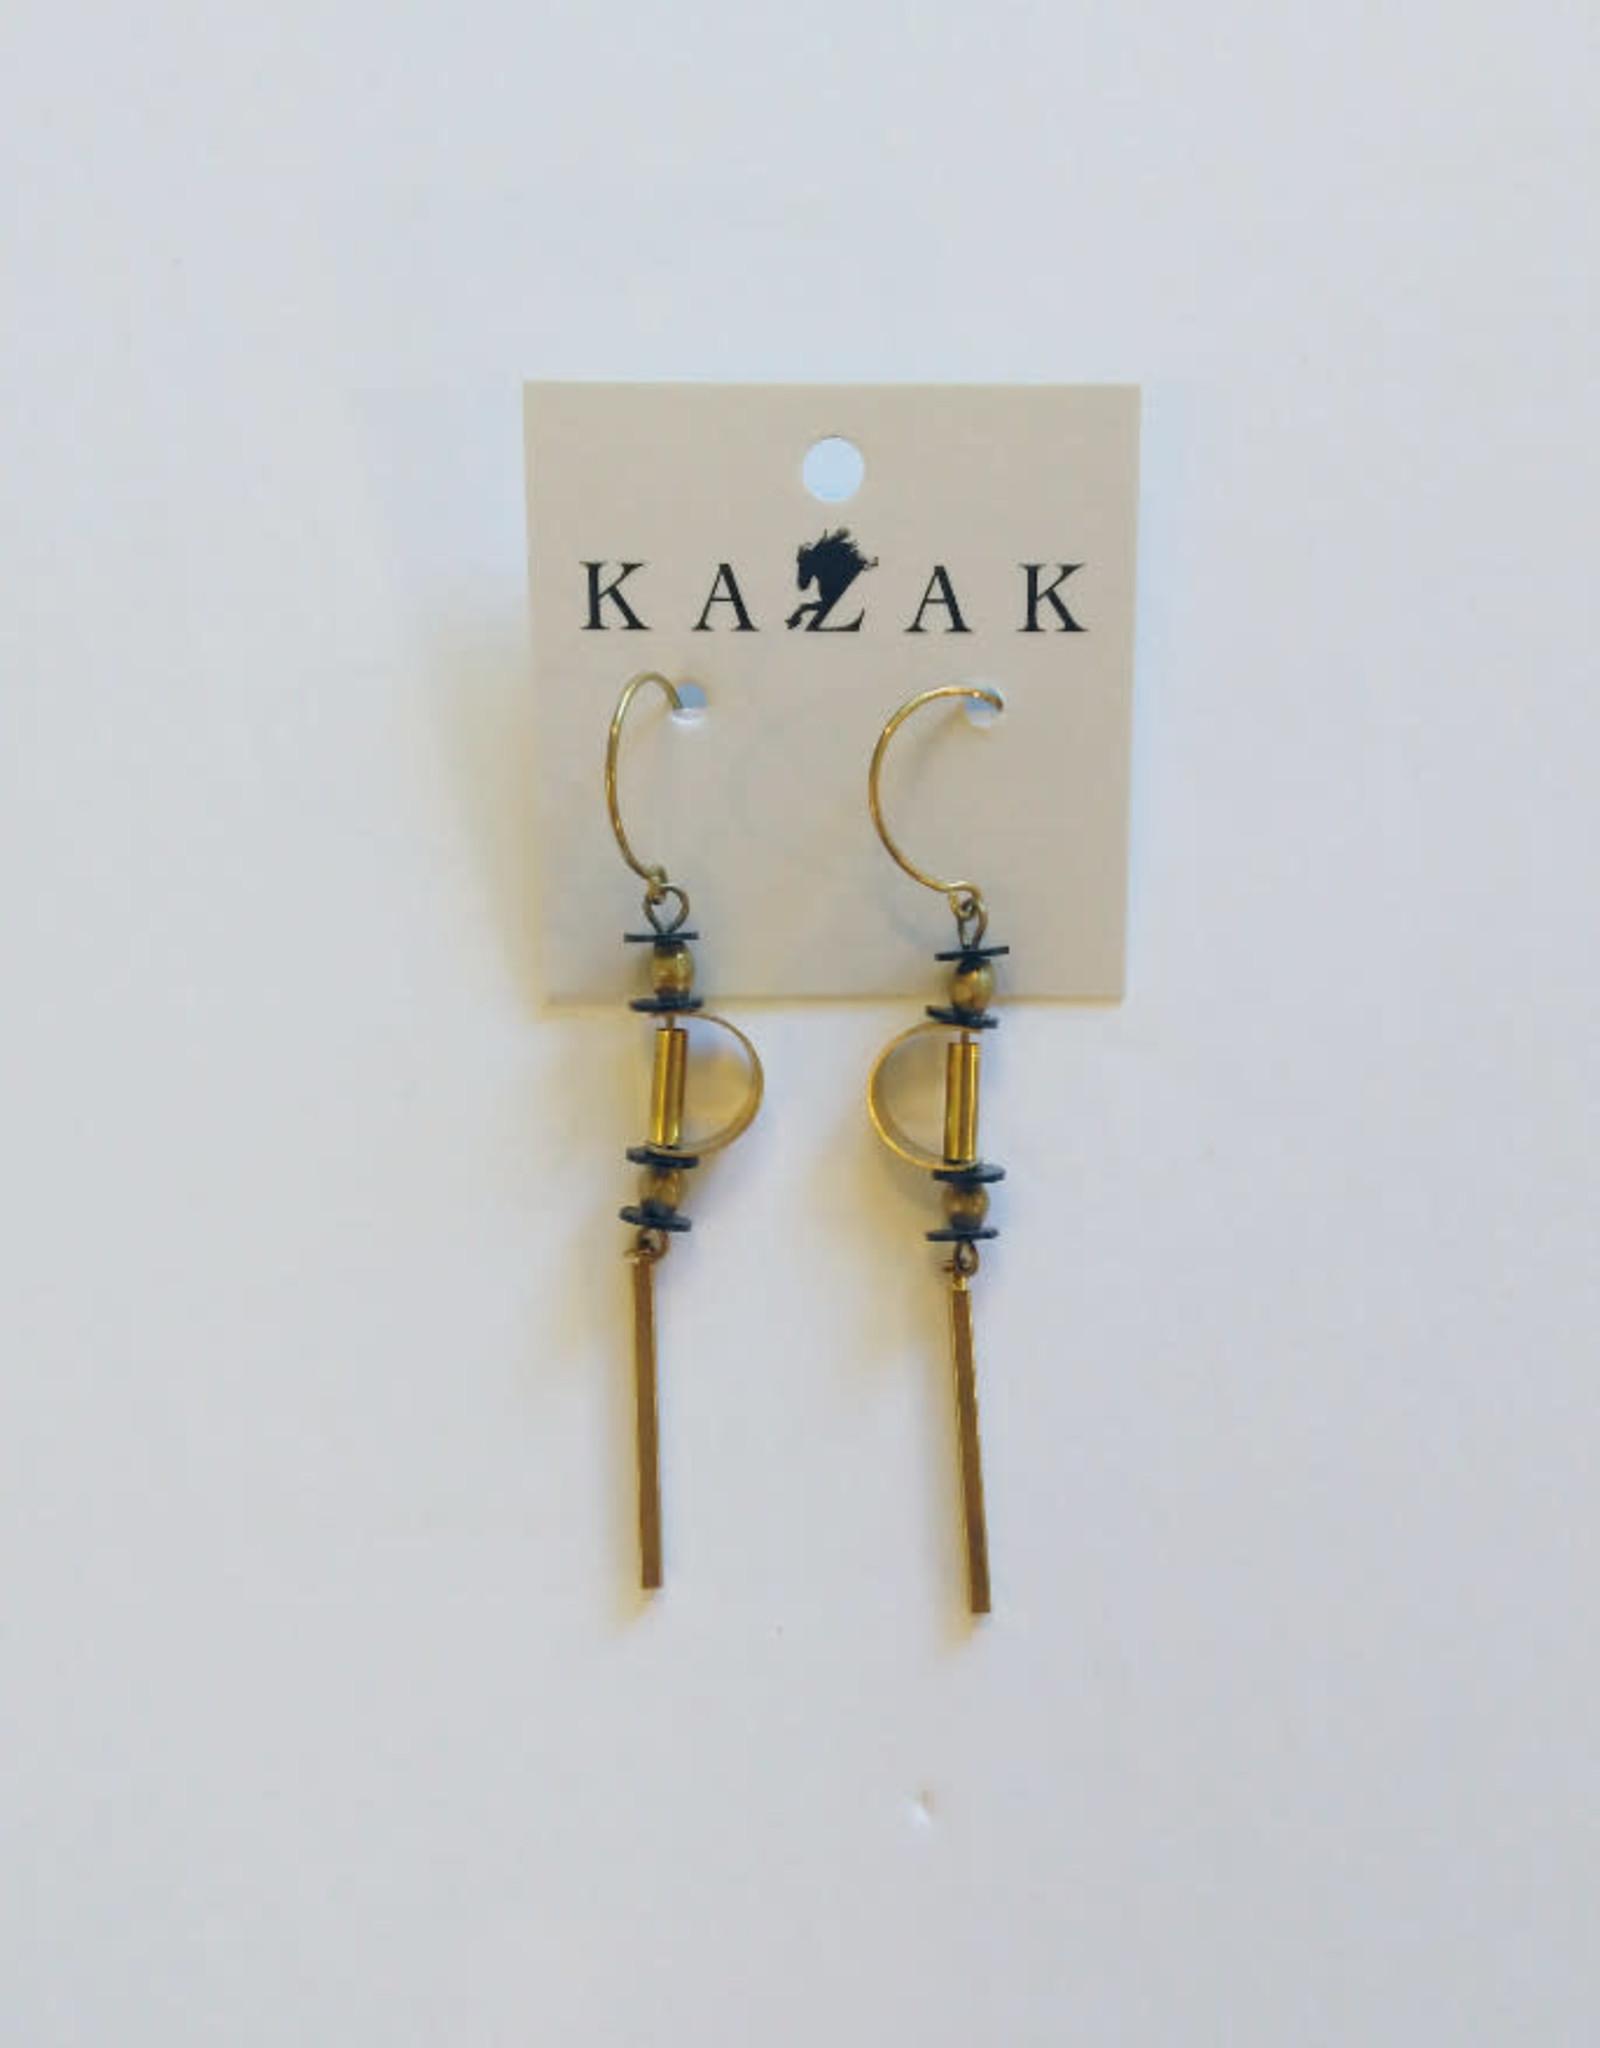 Kazak Boucles d'oreilles Ceres PE18 Kazak  Noir